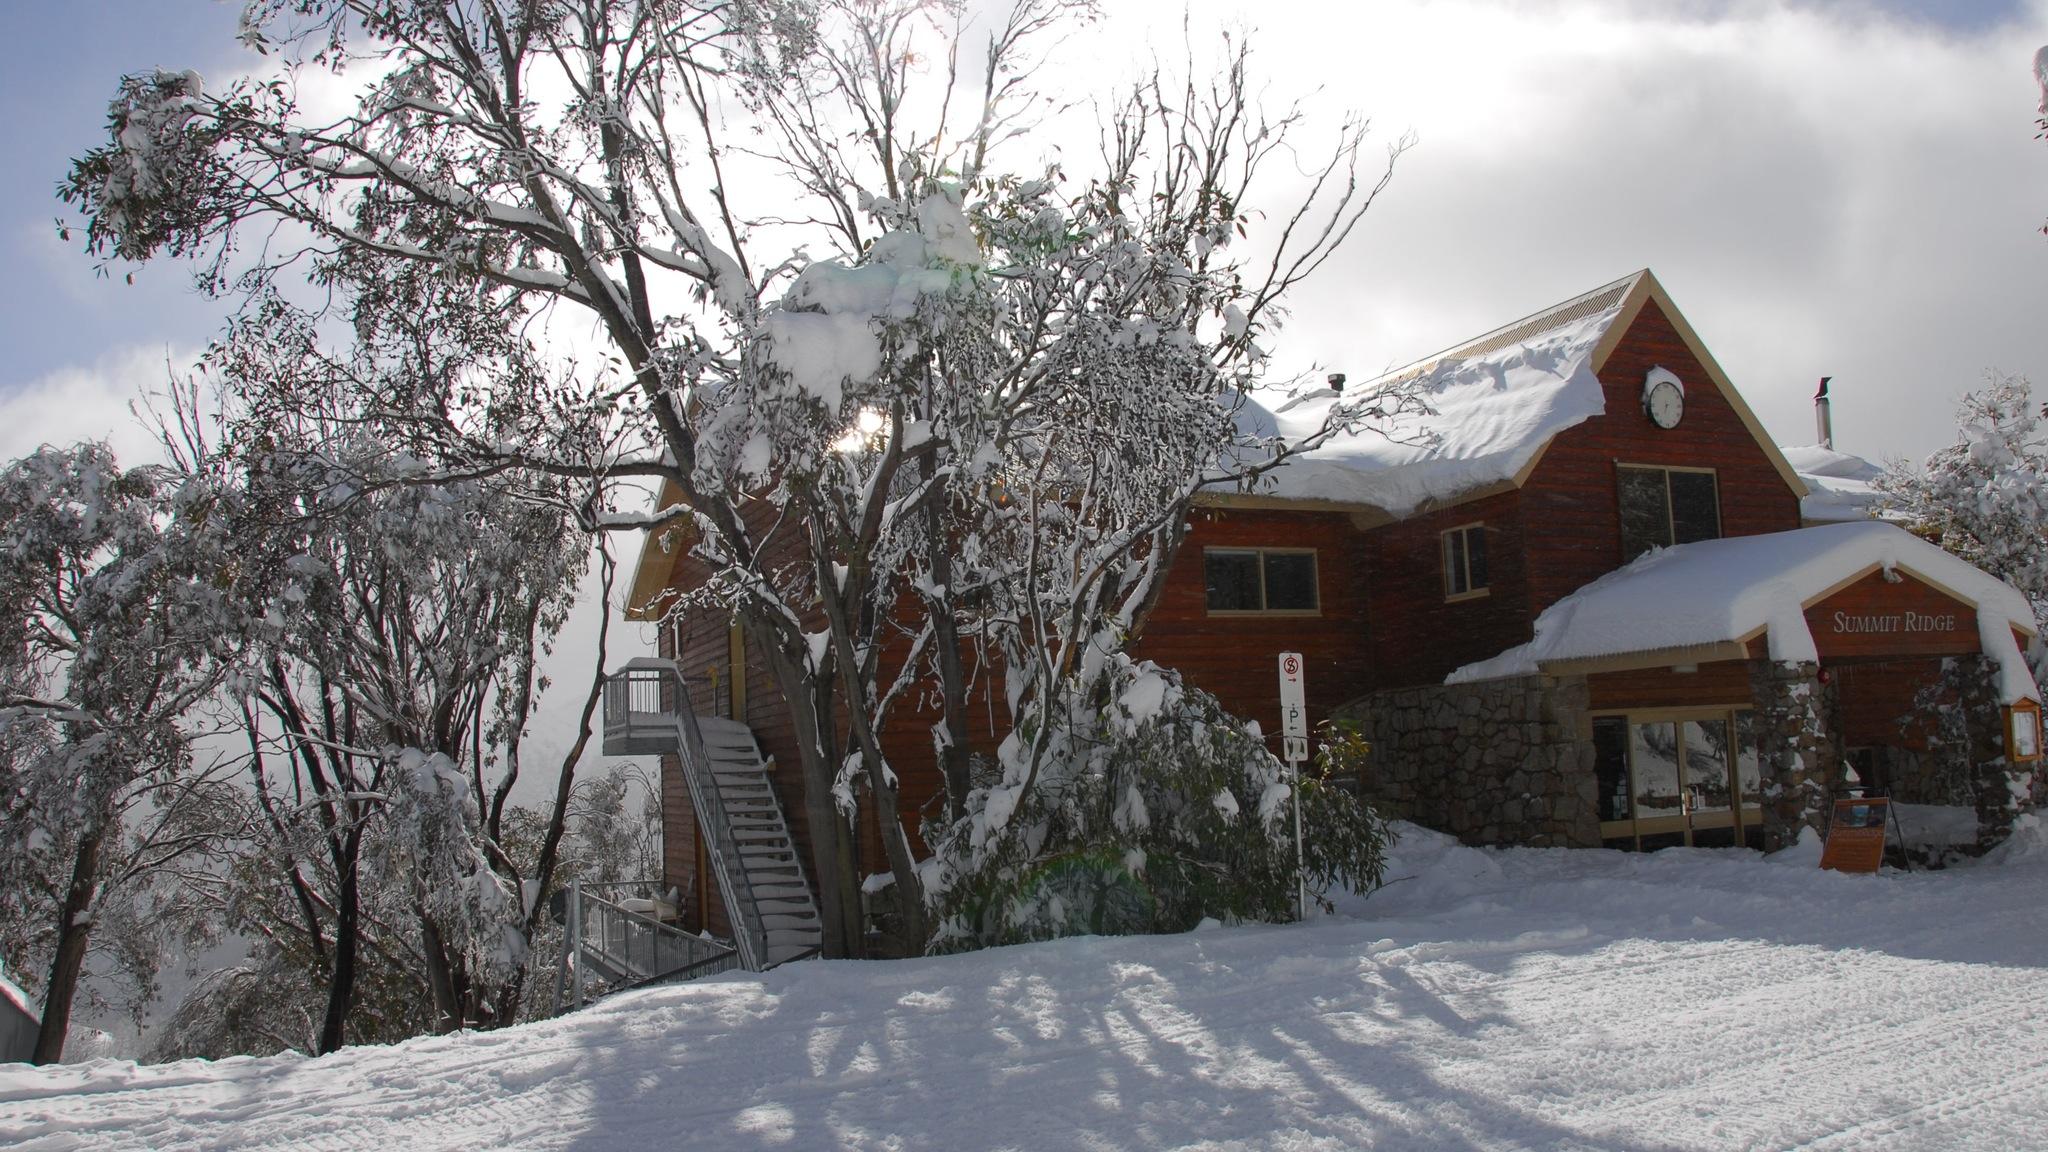 Summit Ridge Lodge